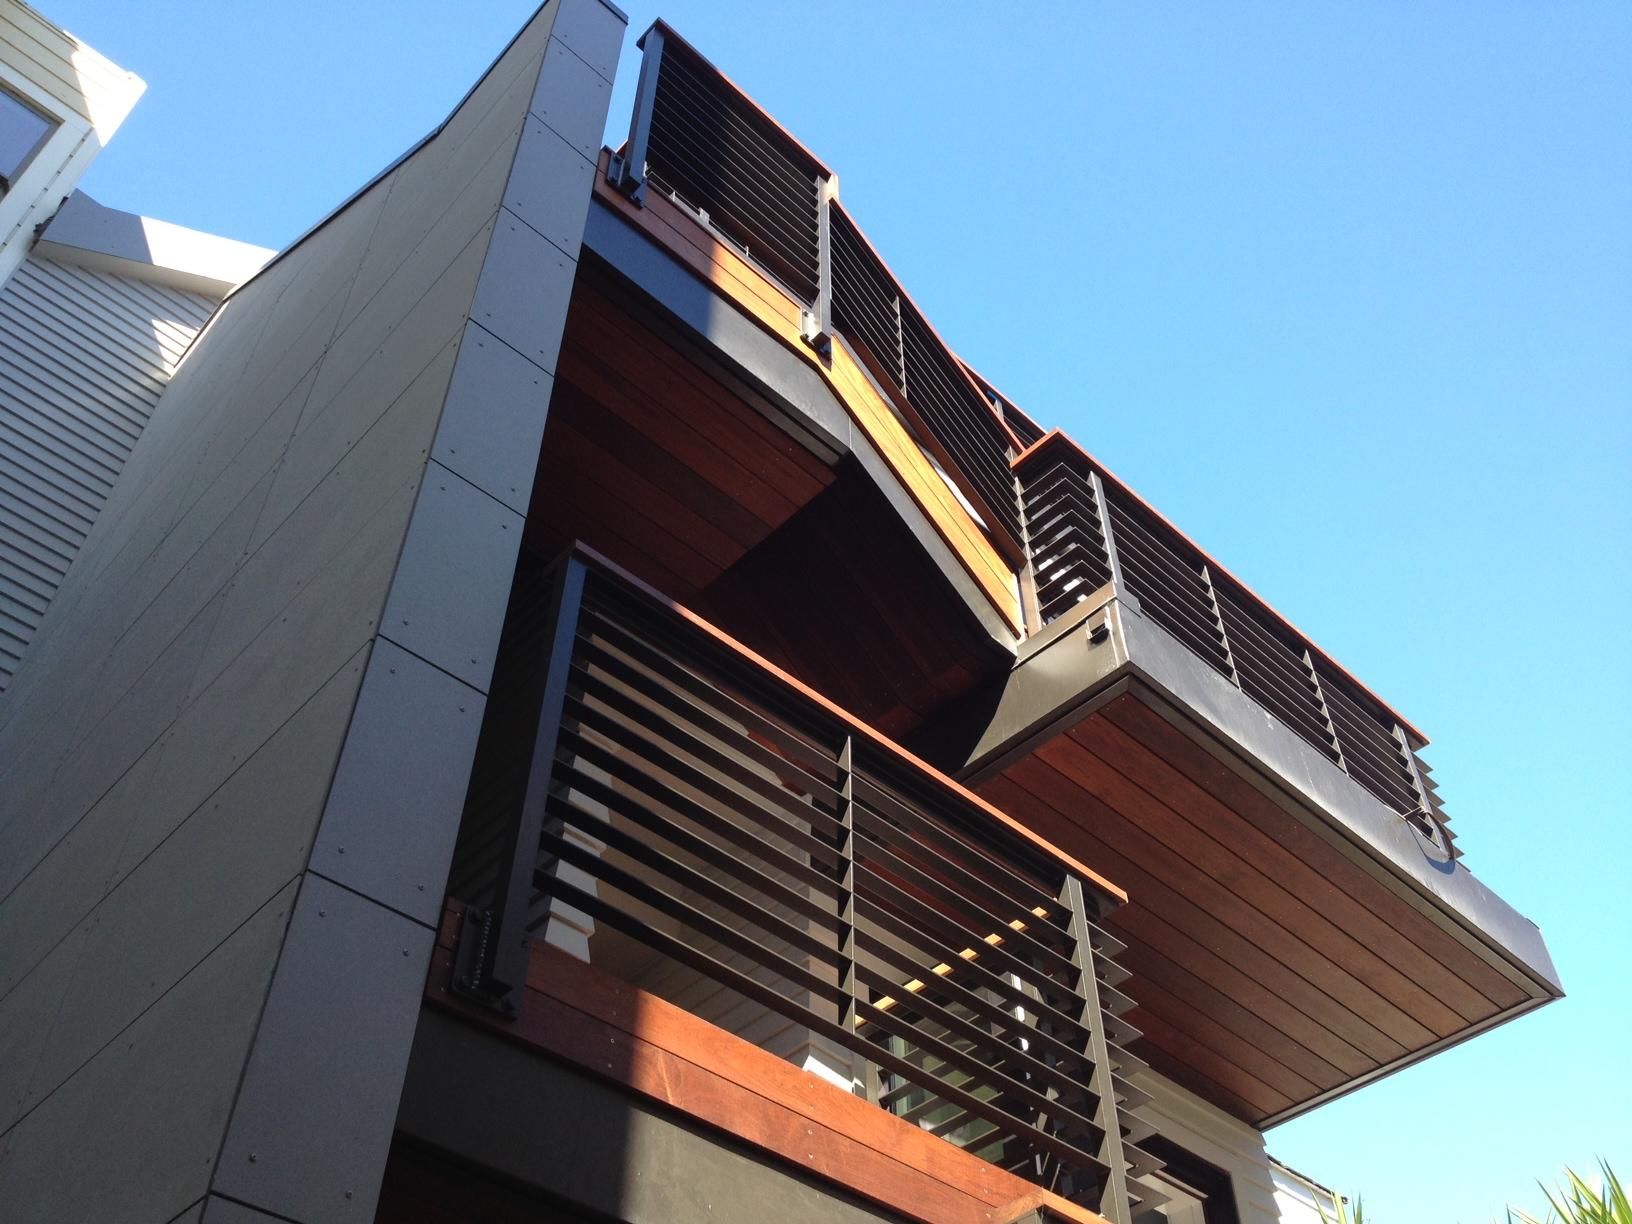 17th street condominiums